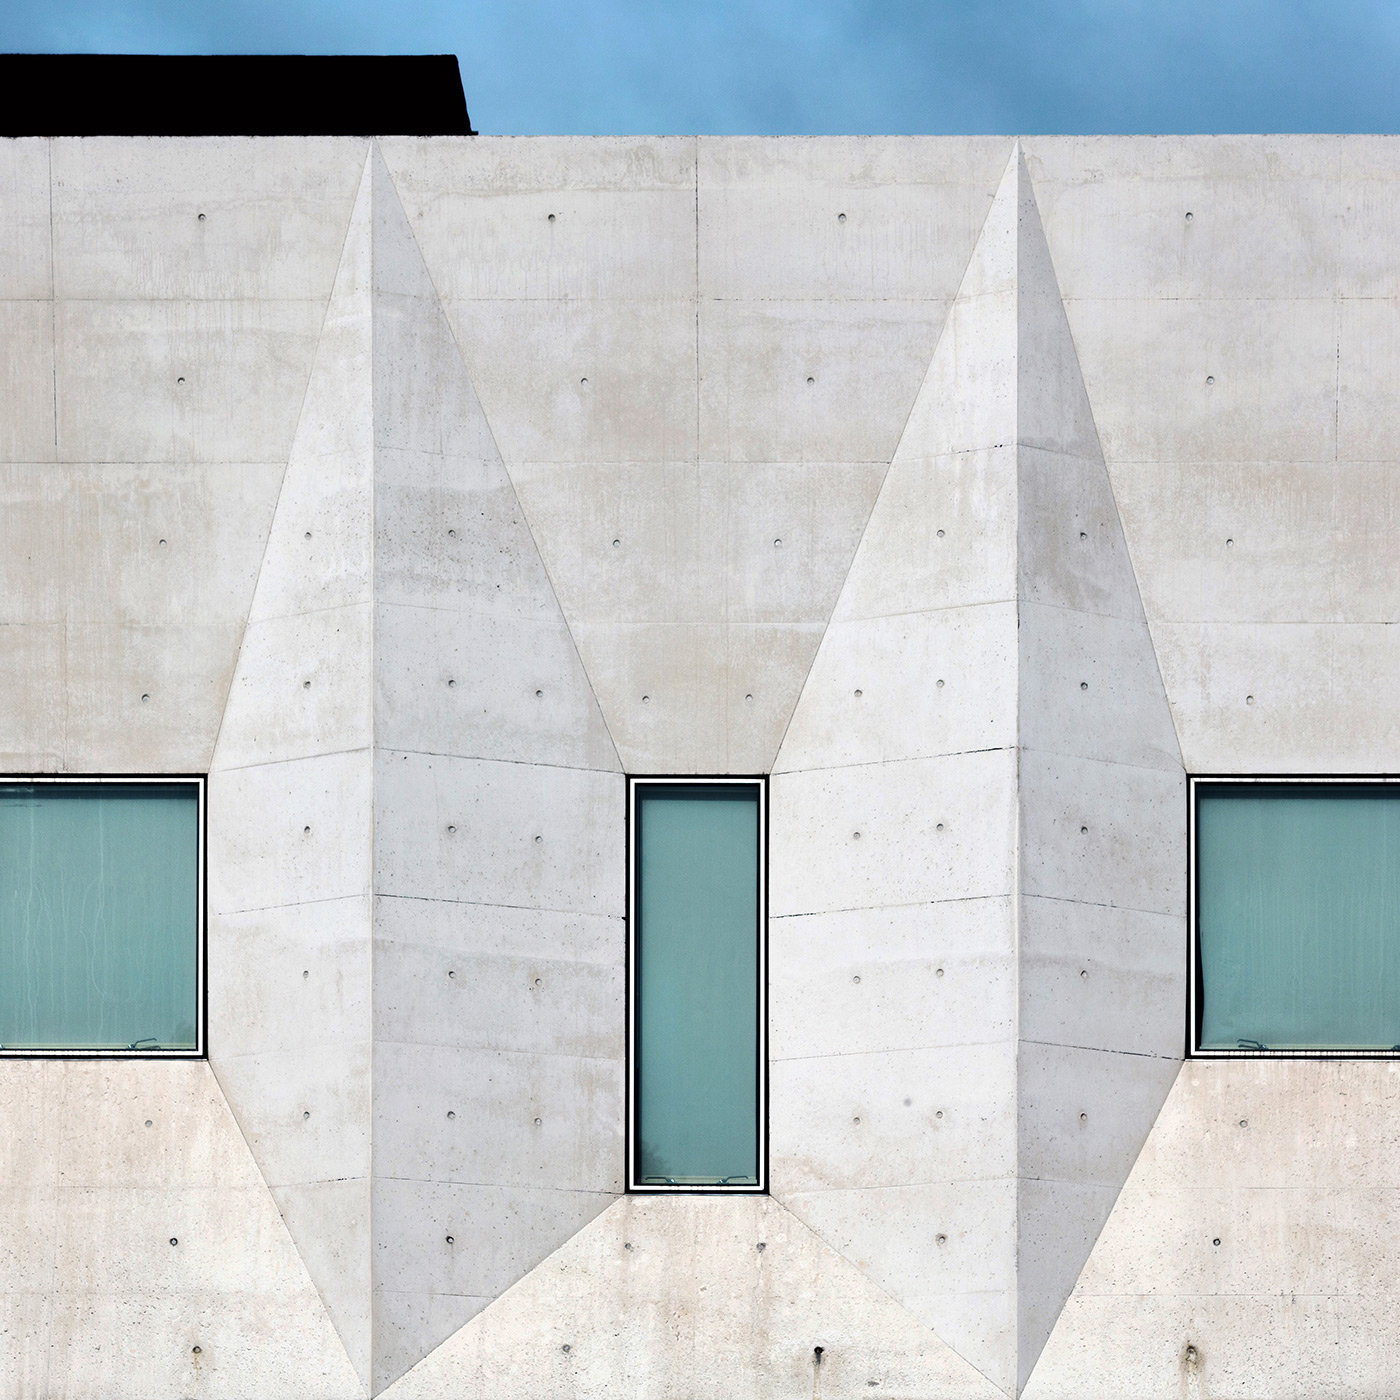 Palacio de Justica de Gouveia Location: Gouveia, Portugal Architect: Barbosa & Guimaraes Architects